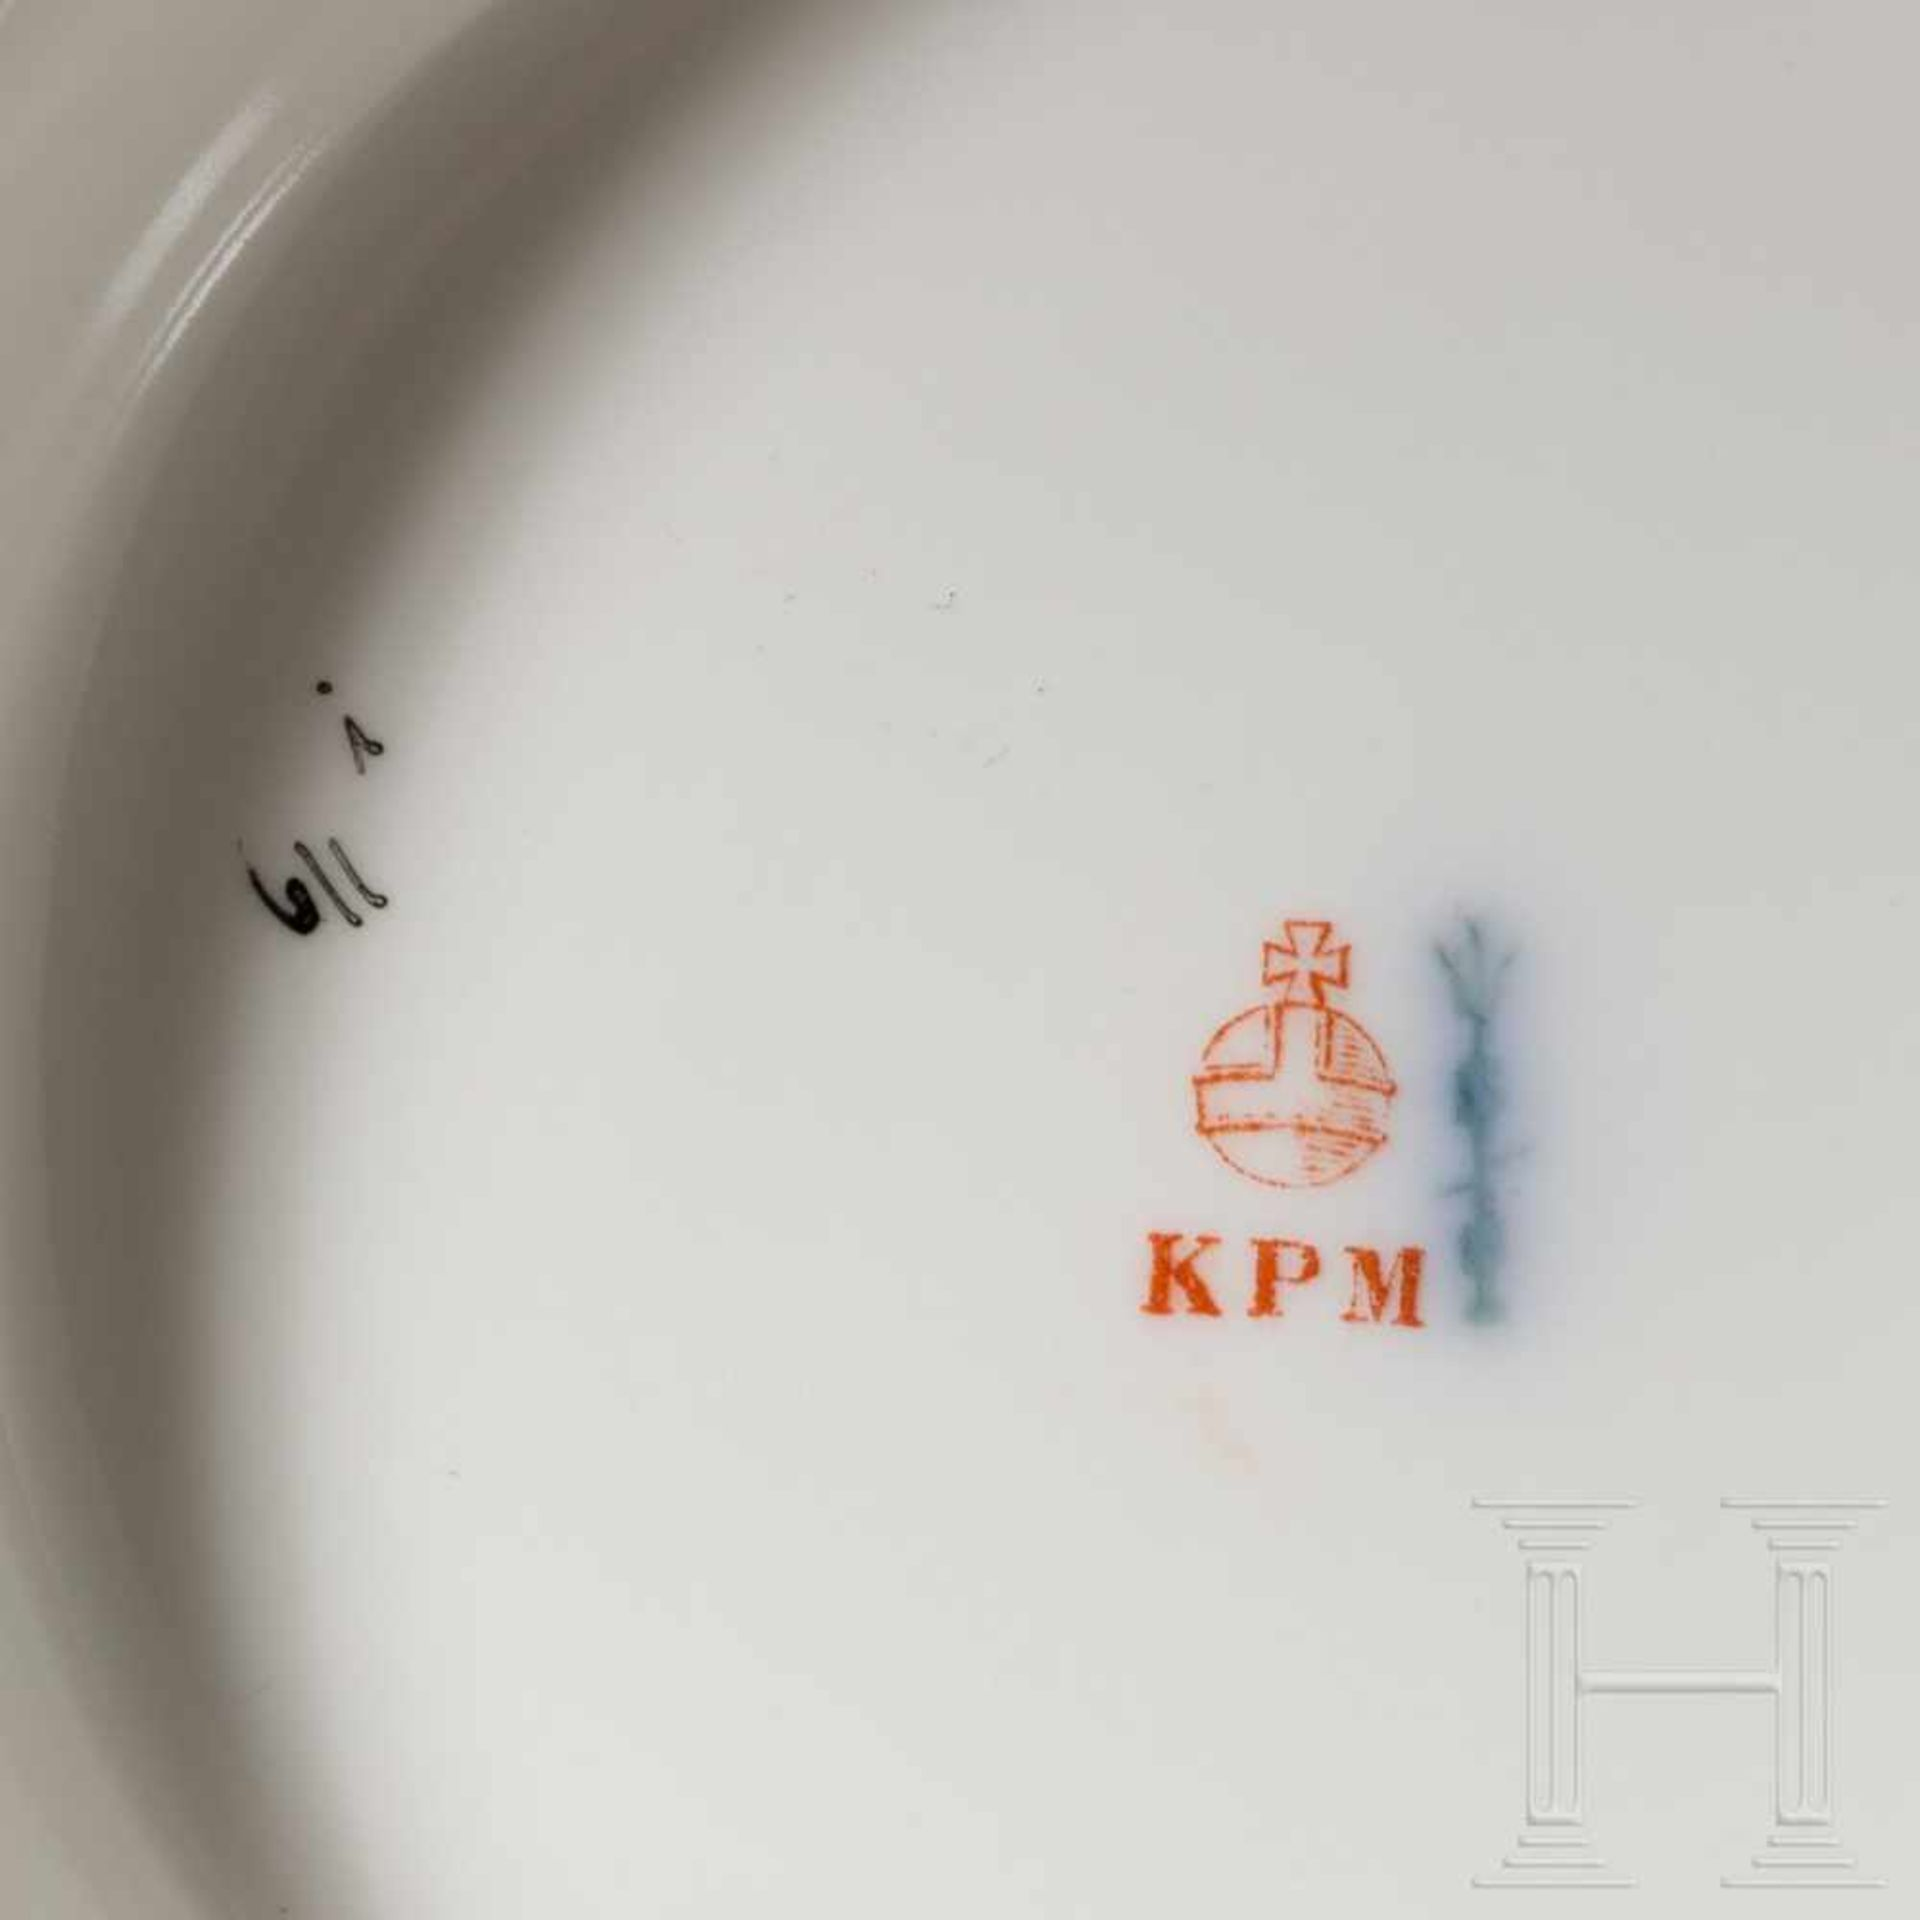 Los 6037 - Hermann Göring - large lidded terrine from his KPM dining serviceWeißes, glasiertes Porzellan mit